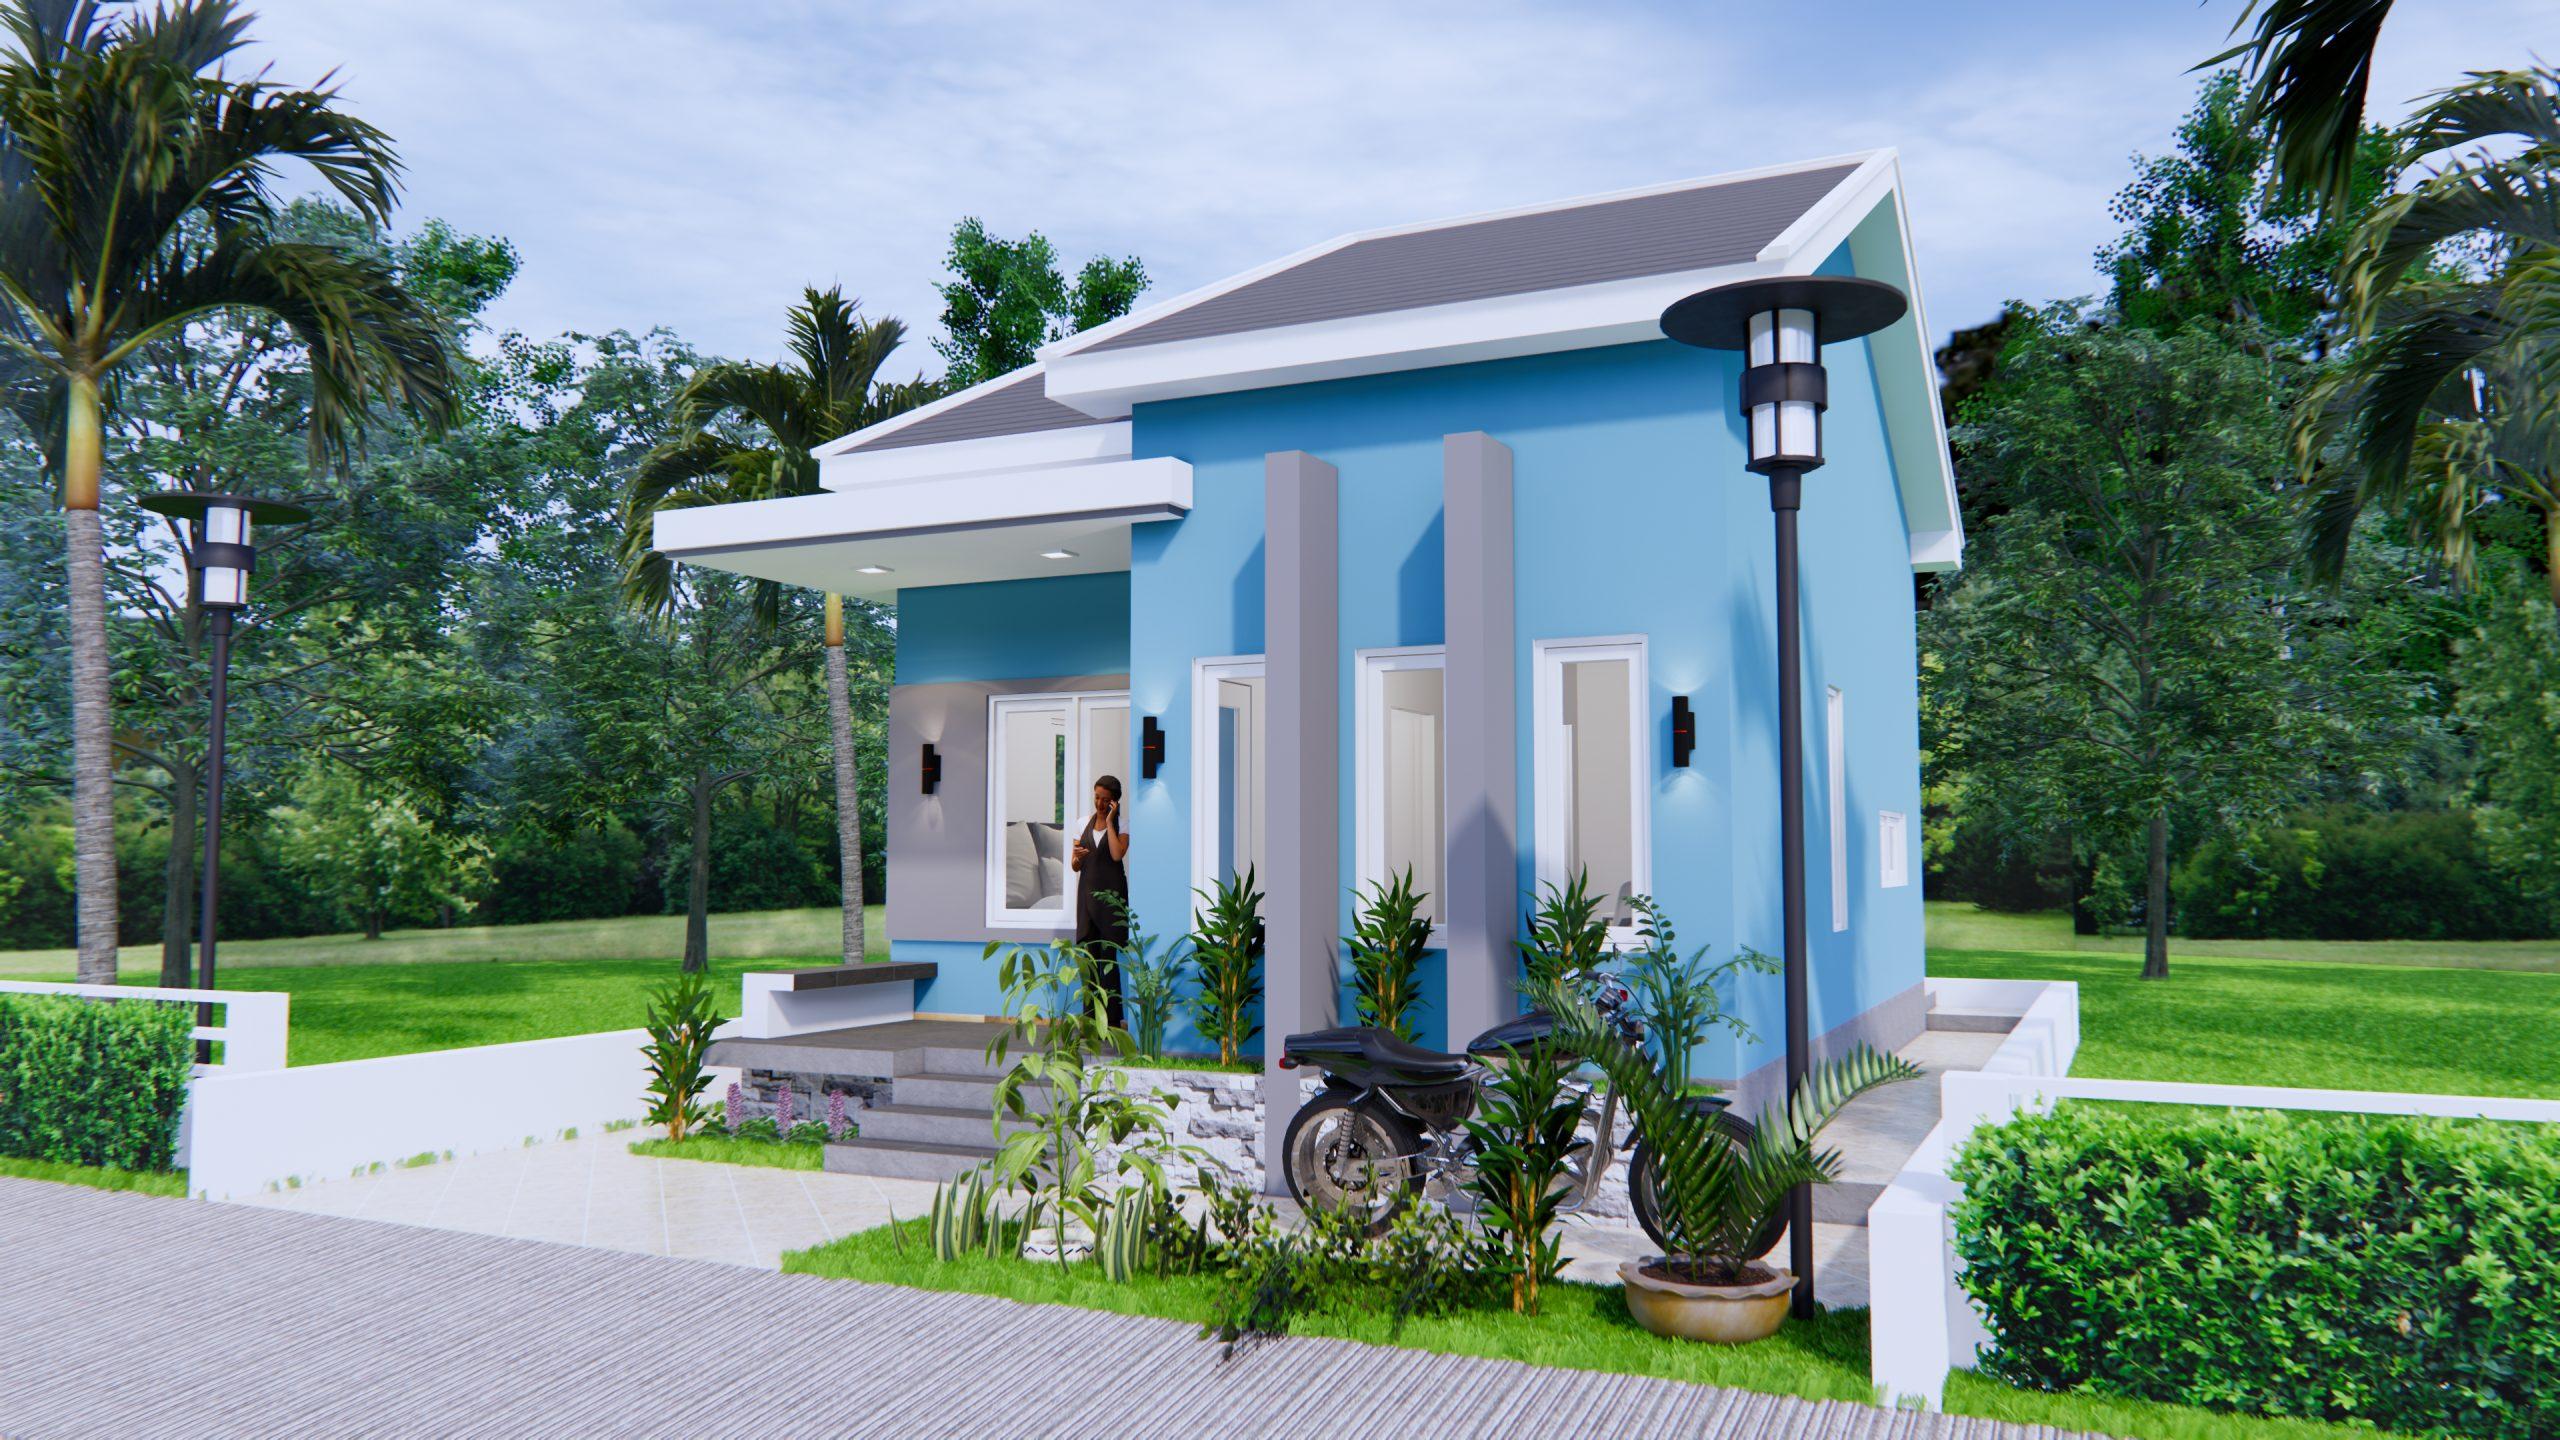 Small House Floor Plans 6x8 Meter 20x27 Feet 2 Beds 2